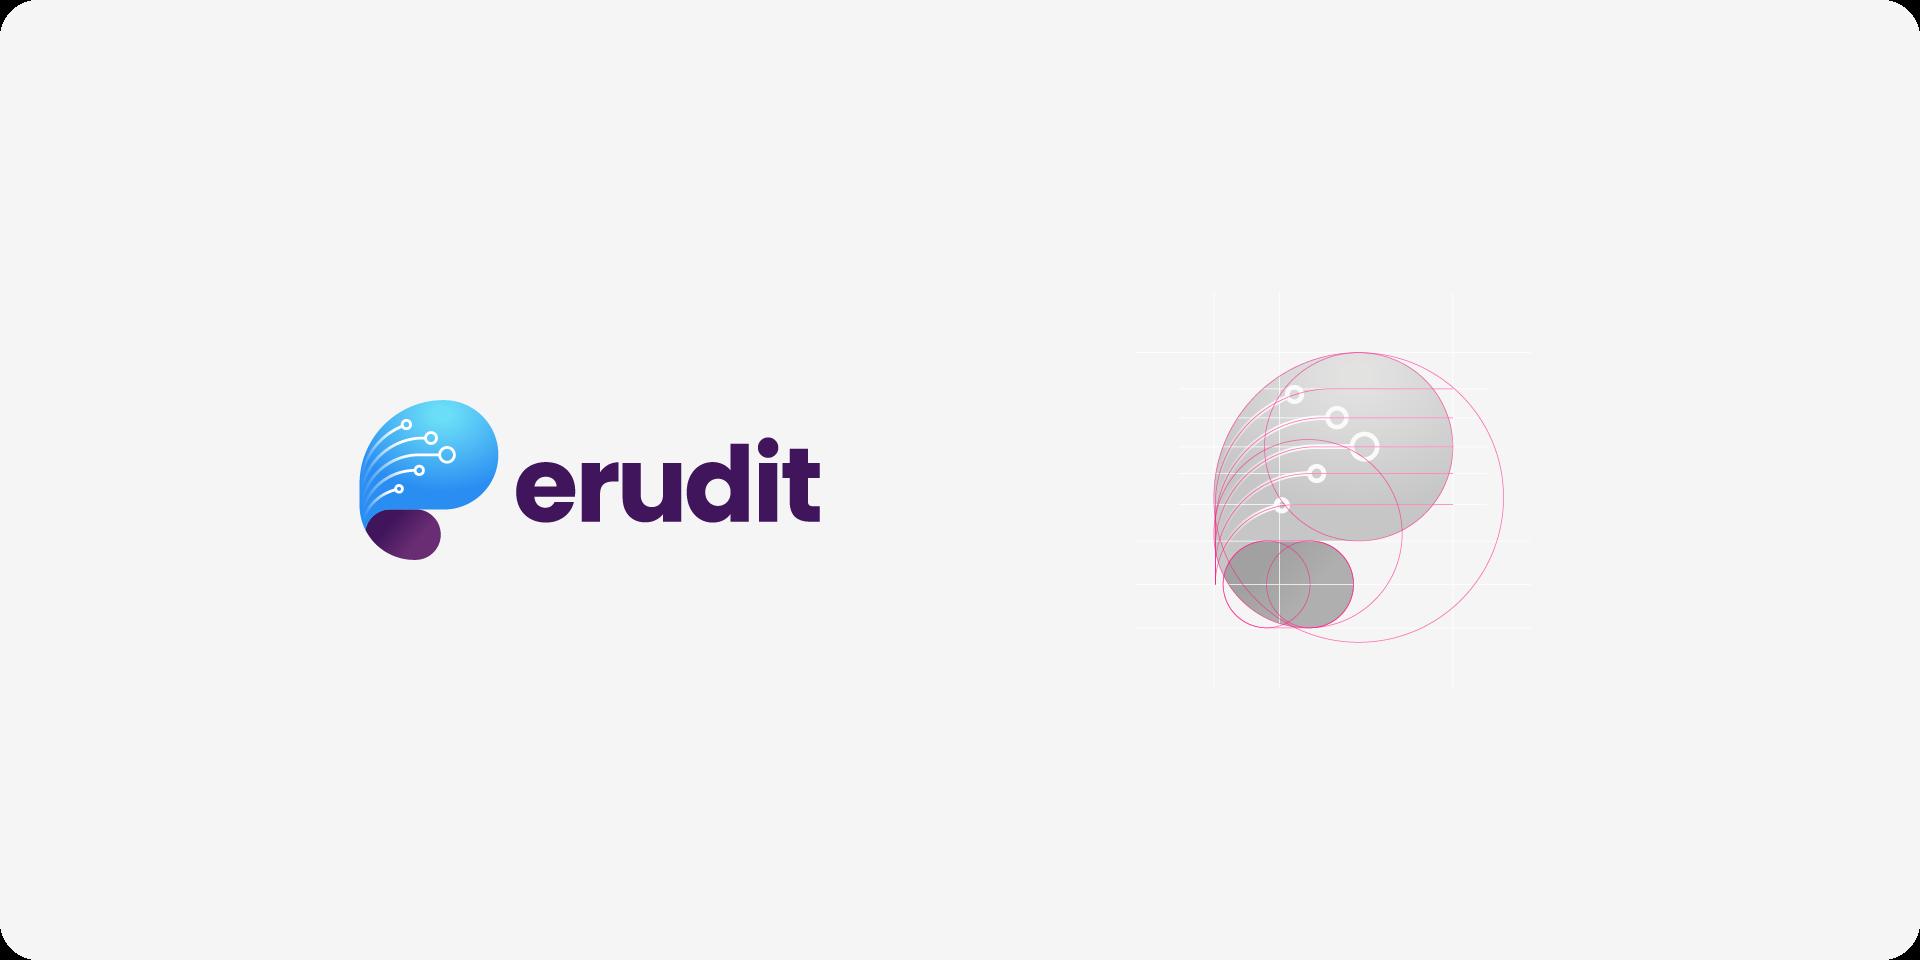 erudit logotype breakdown